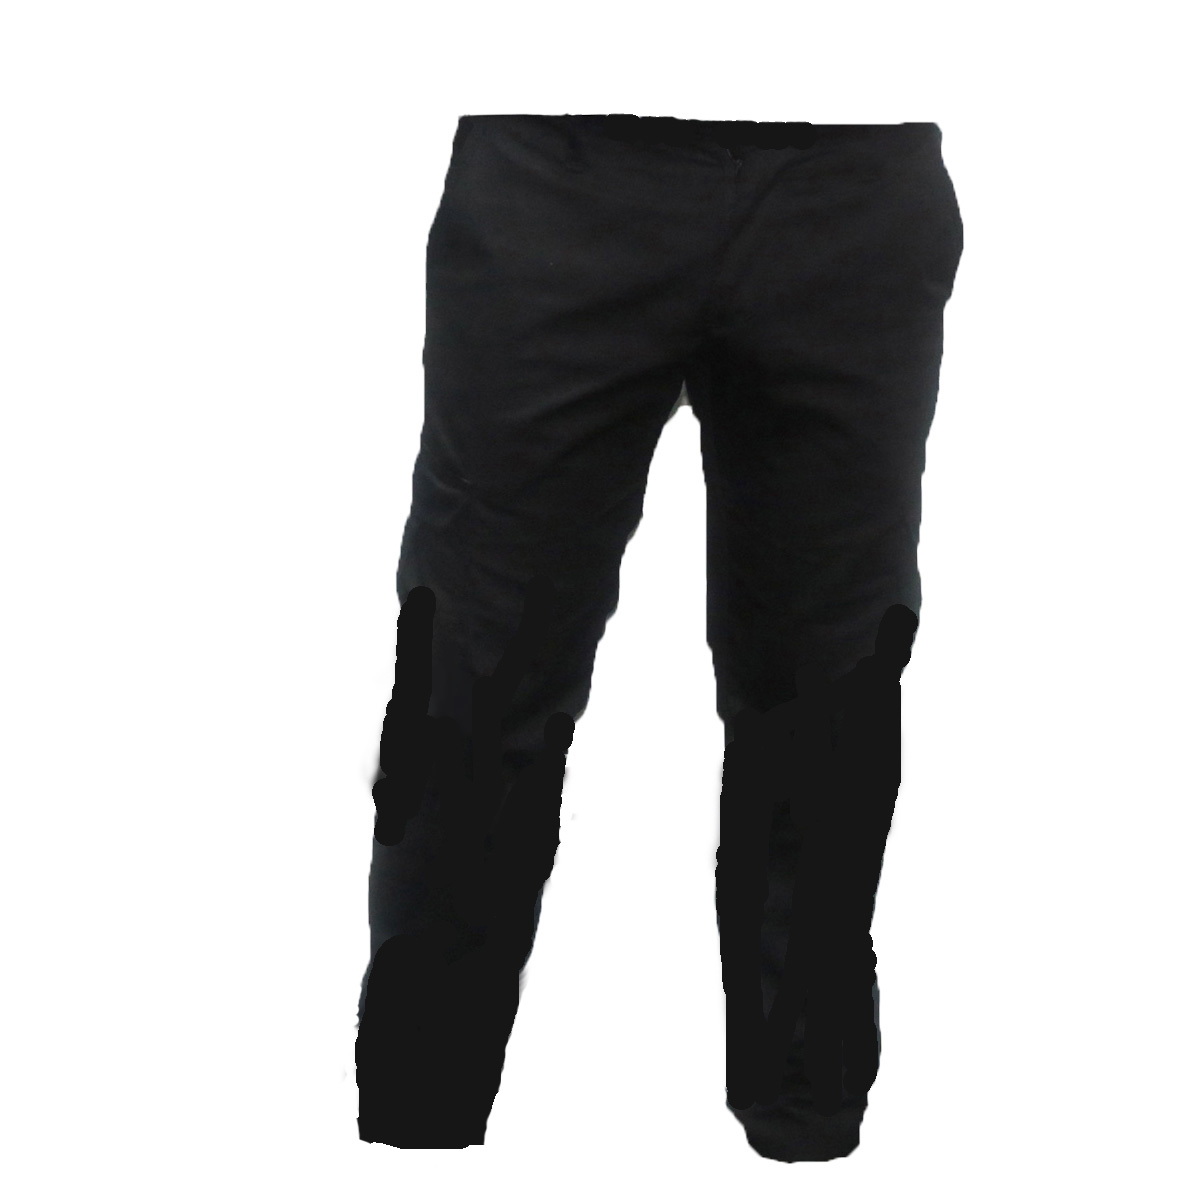 Pantalone Fracuske vojske